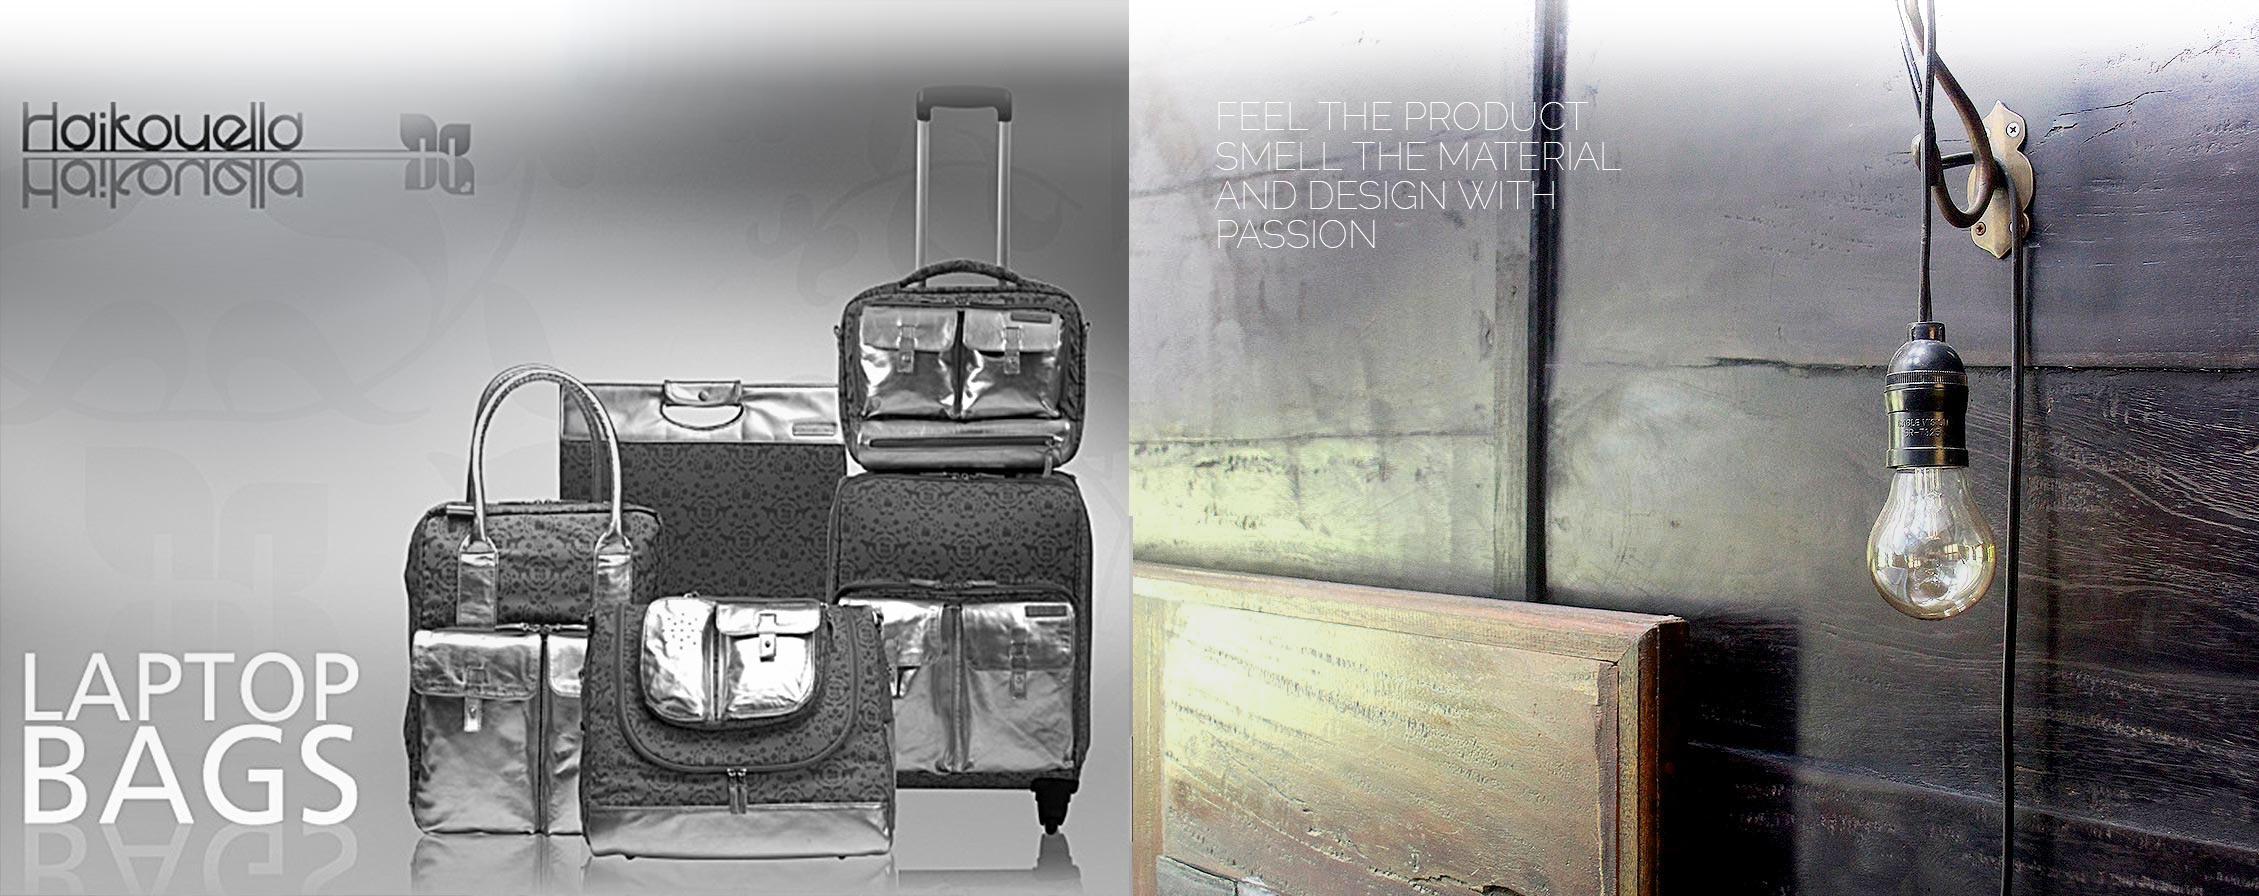 produkt design boards bags accessories muenchen agentur v5 english